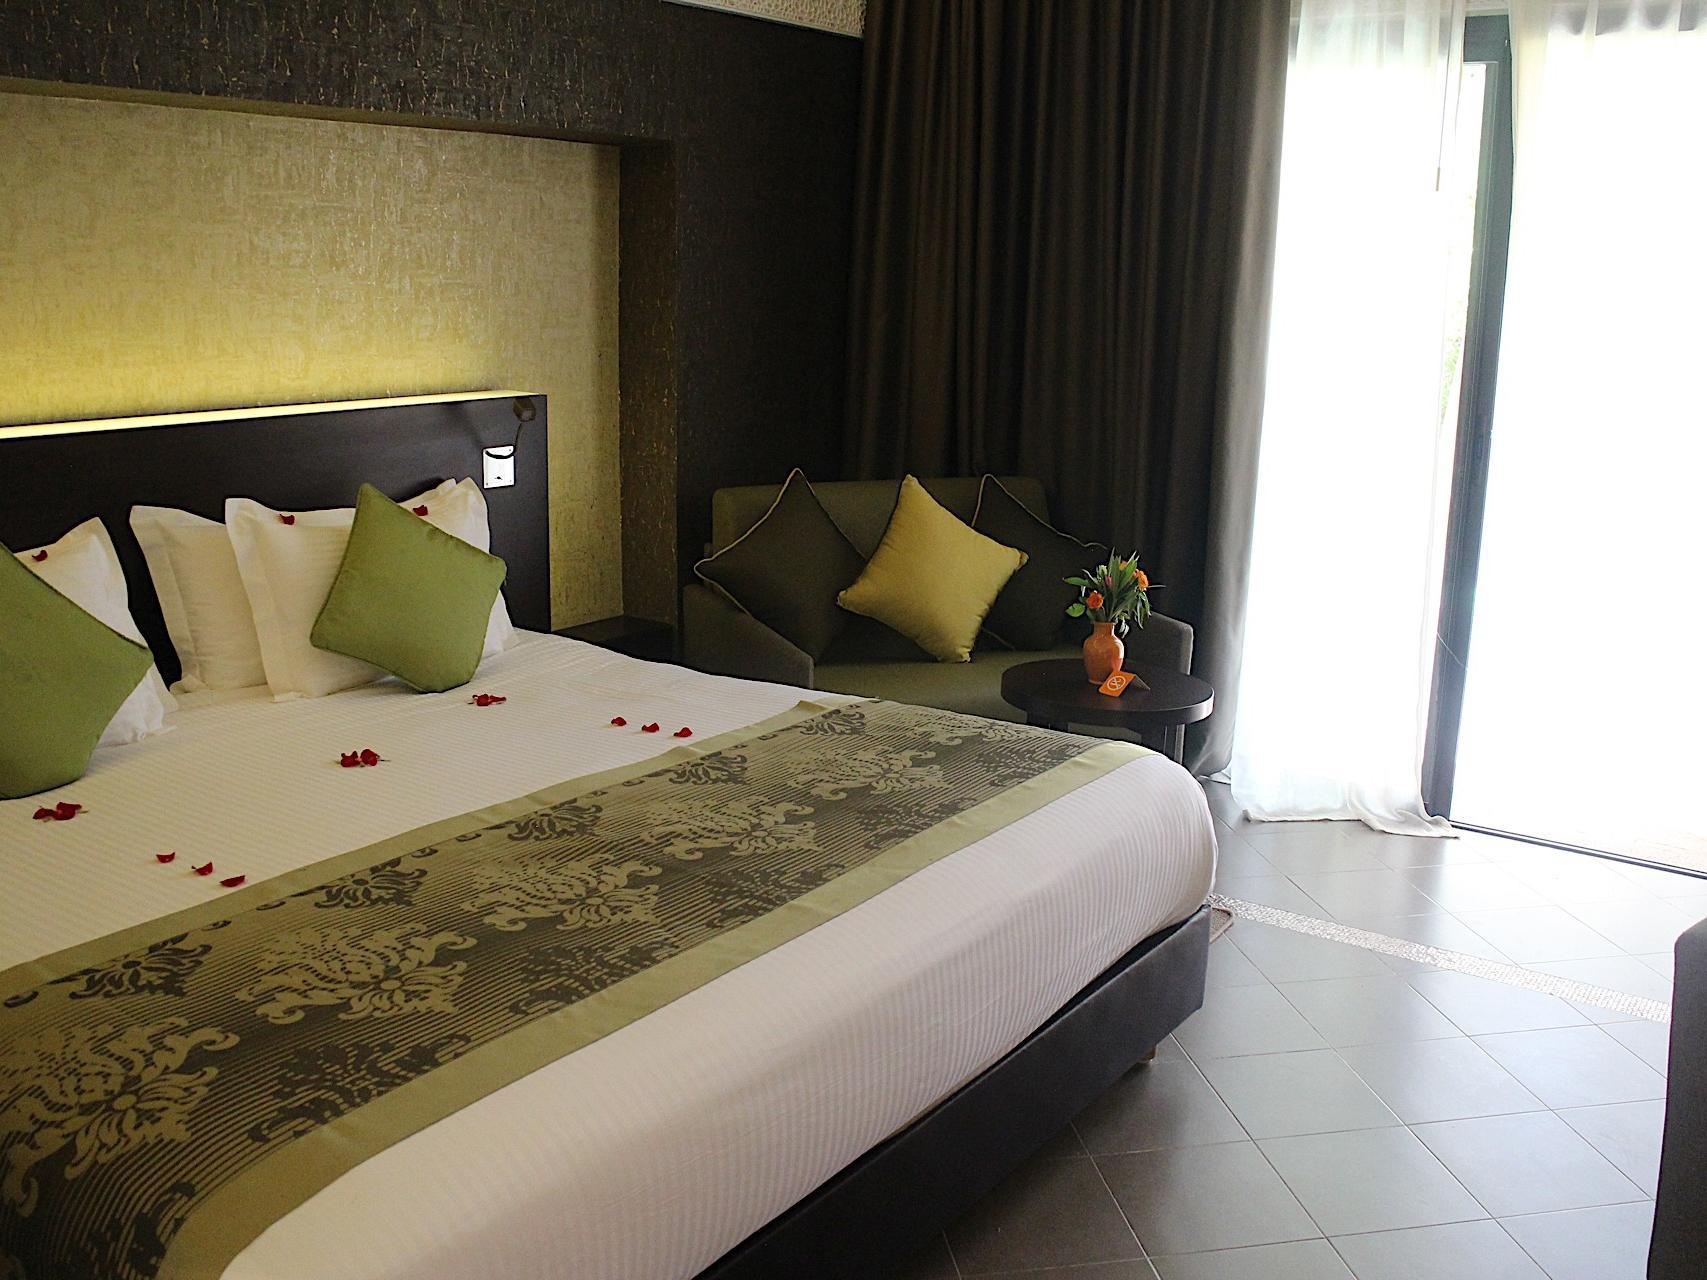 Privilege Room at Kenzi Club Agdal Medina Hotel in Marrakesh, Morocco